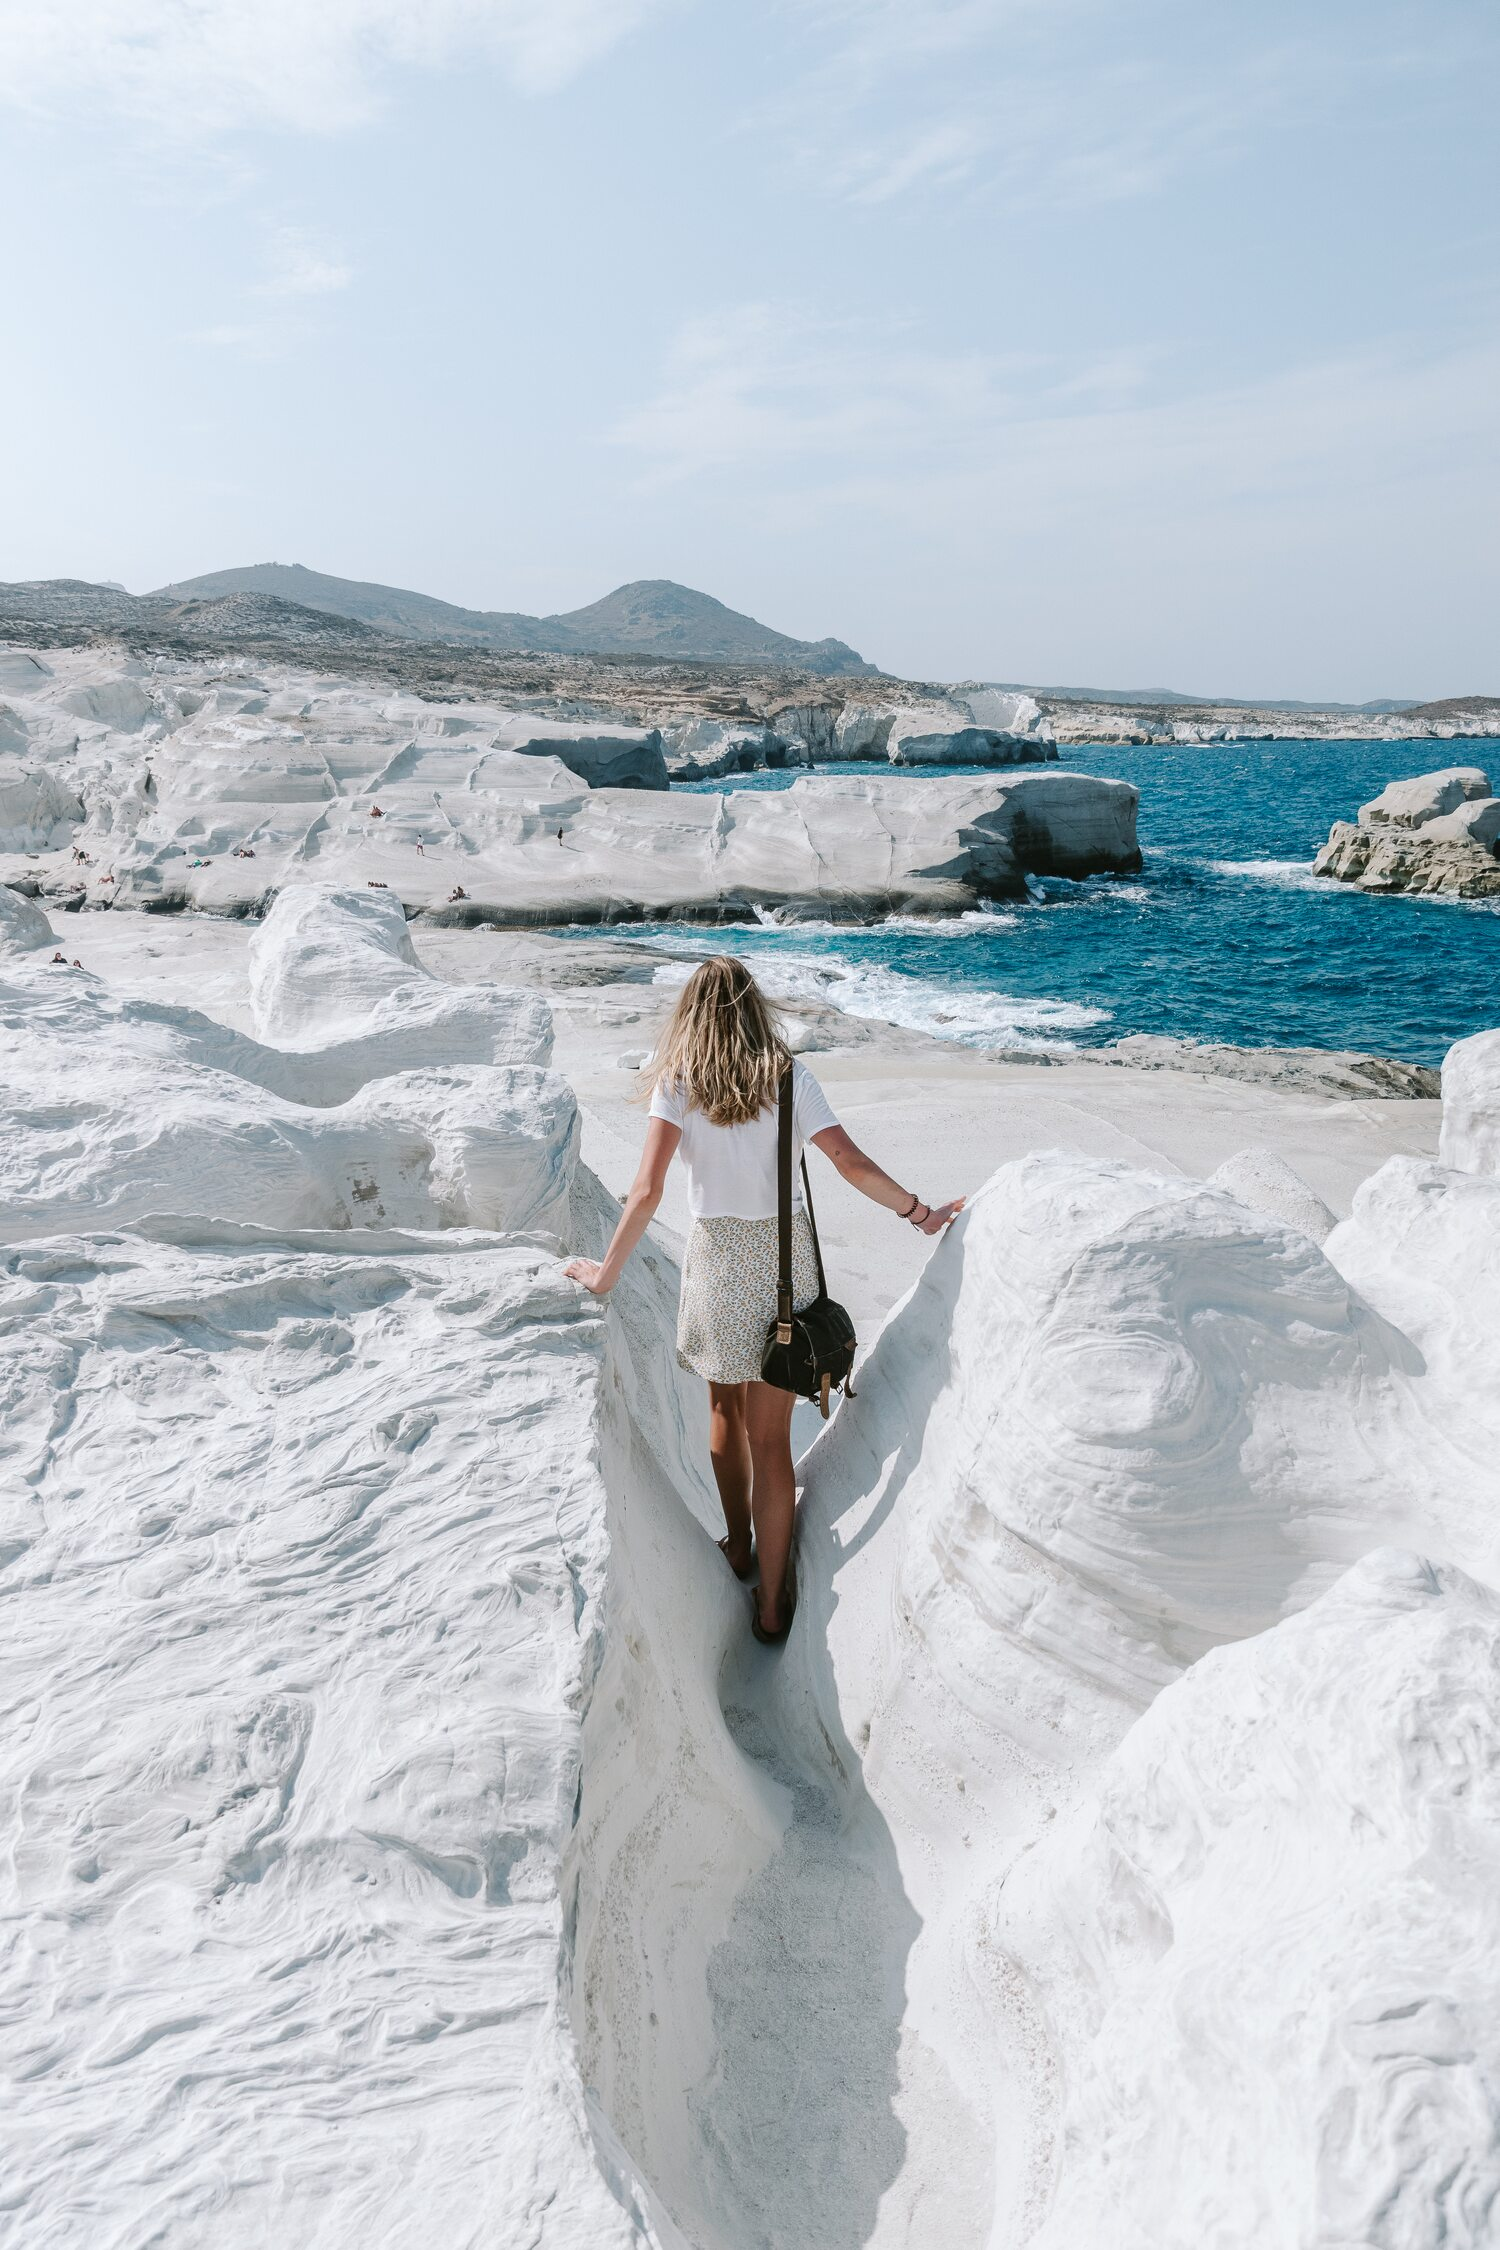 The magnificent Sarakiniko Beach. One of the best Milos beaches on the greek island Milos